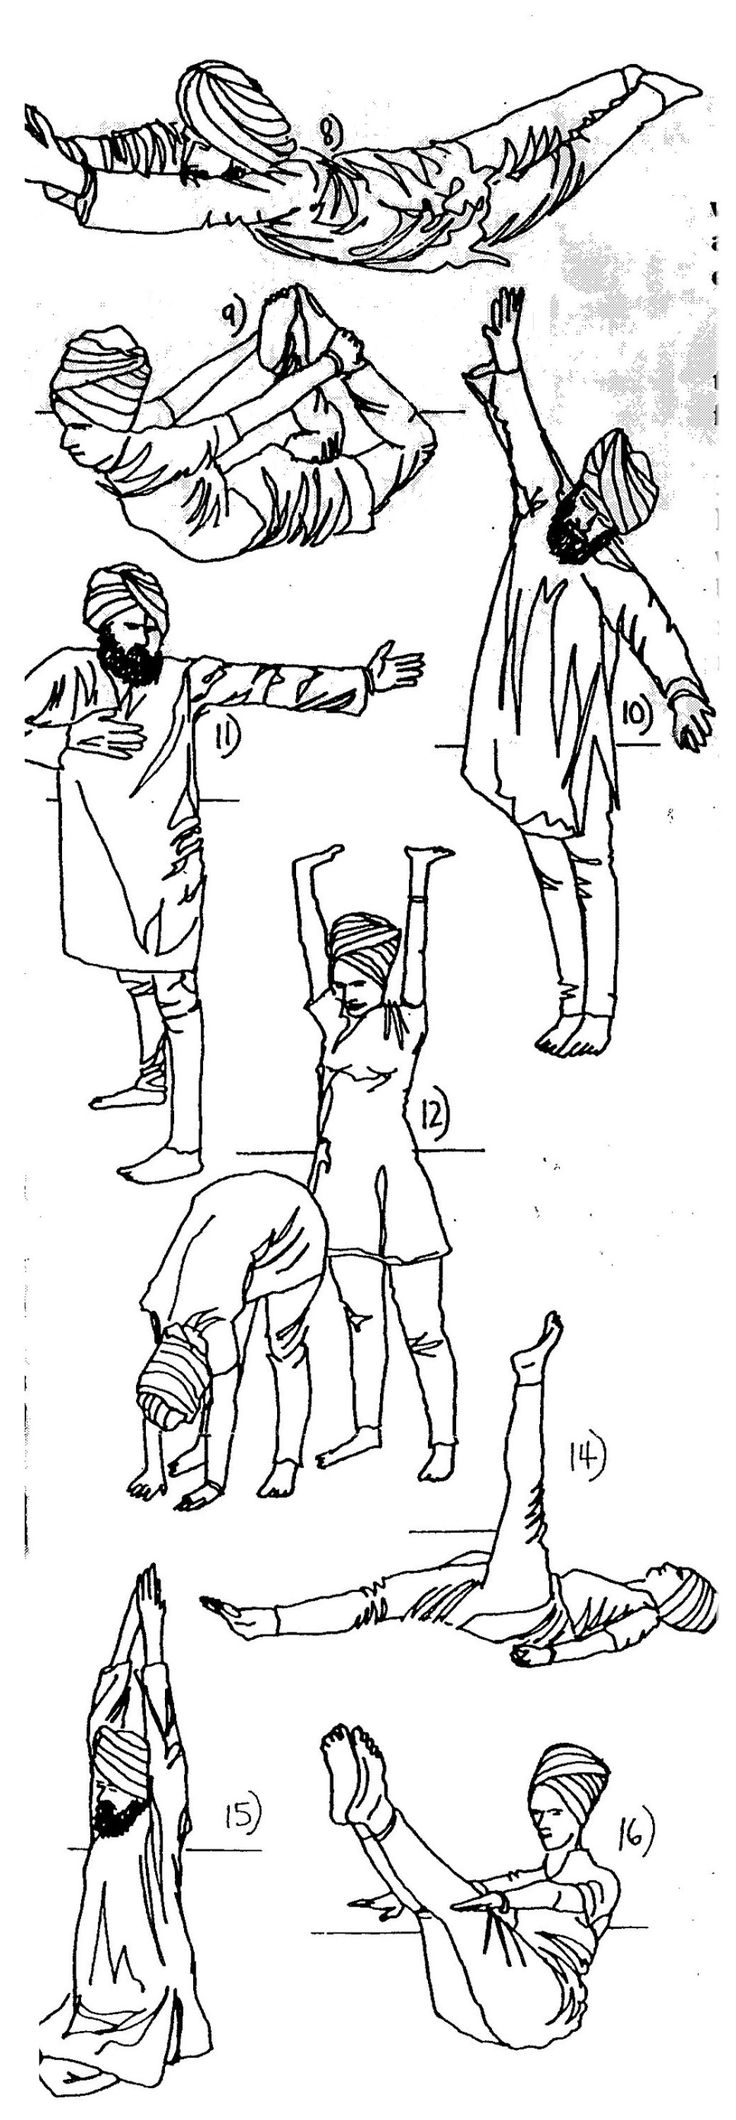 Kundalini Yoga for abdominal strengthening